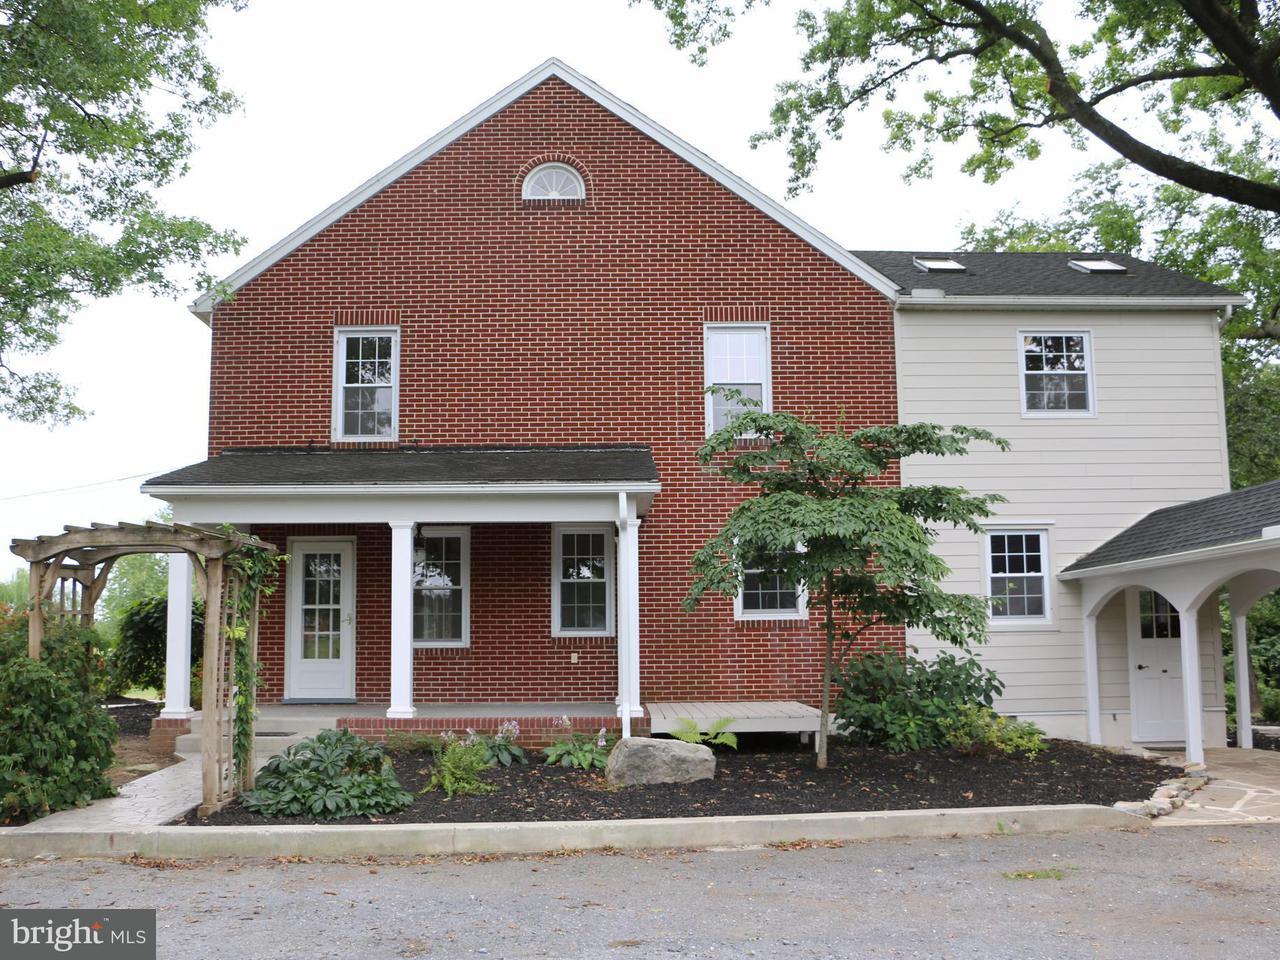 Additional photo for property listing at 2999 Letterkenny Road 2999 Letterkenny Road Chambersburg, Pensilvania 17201 Stati Uniti